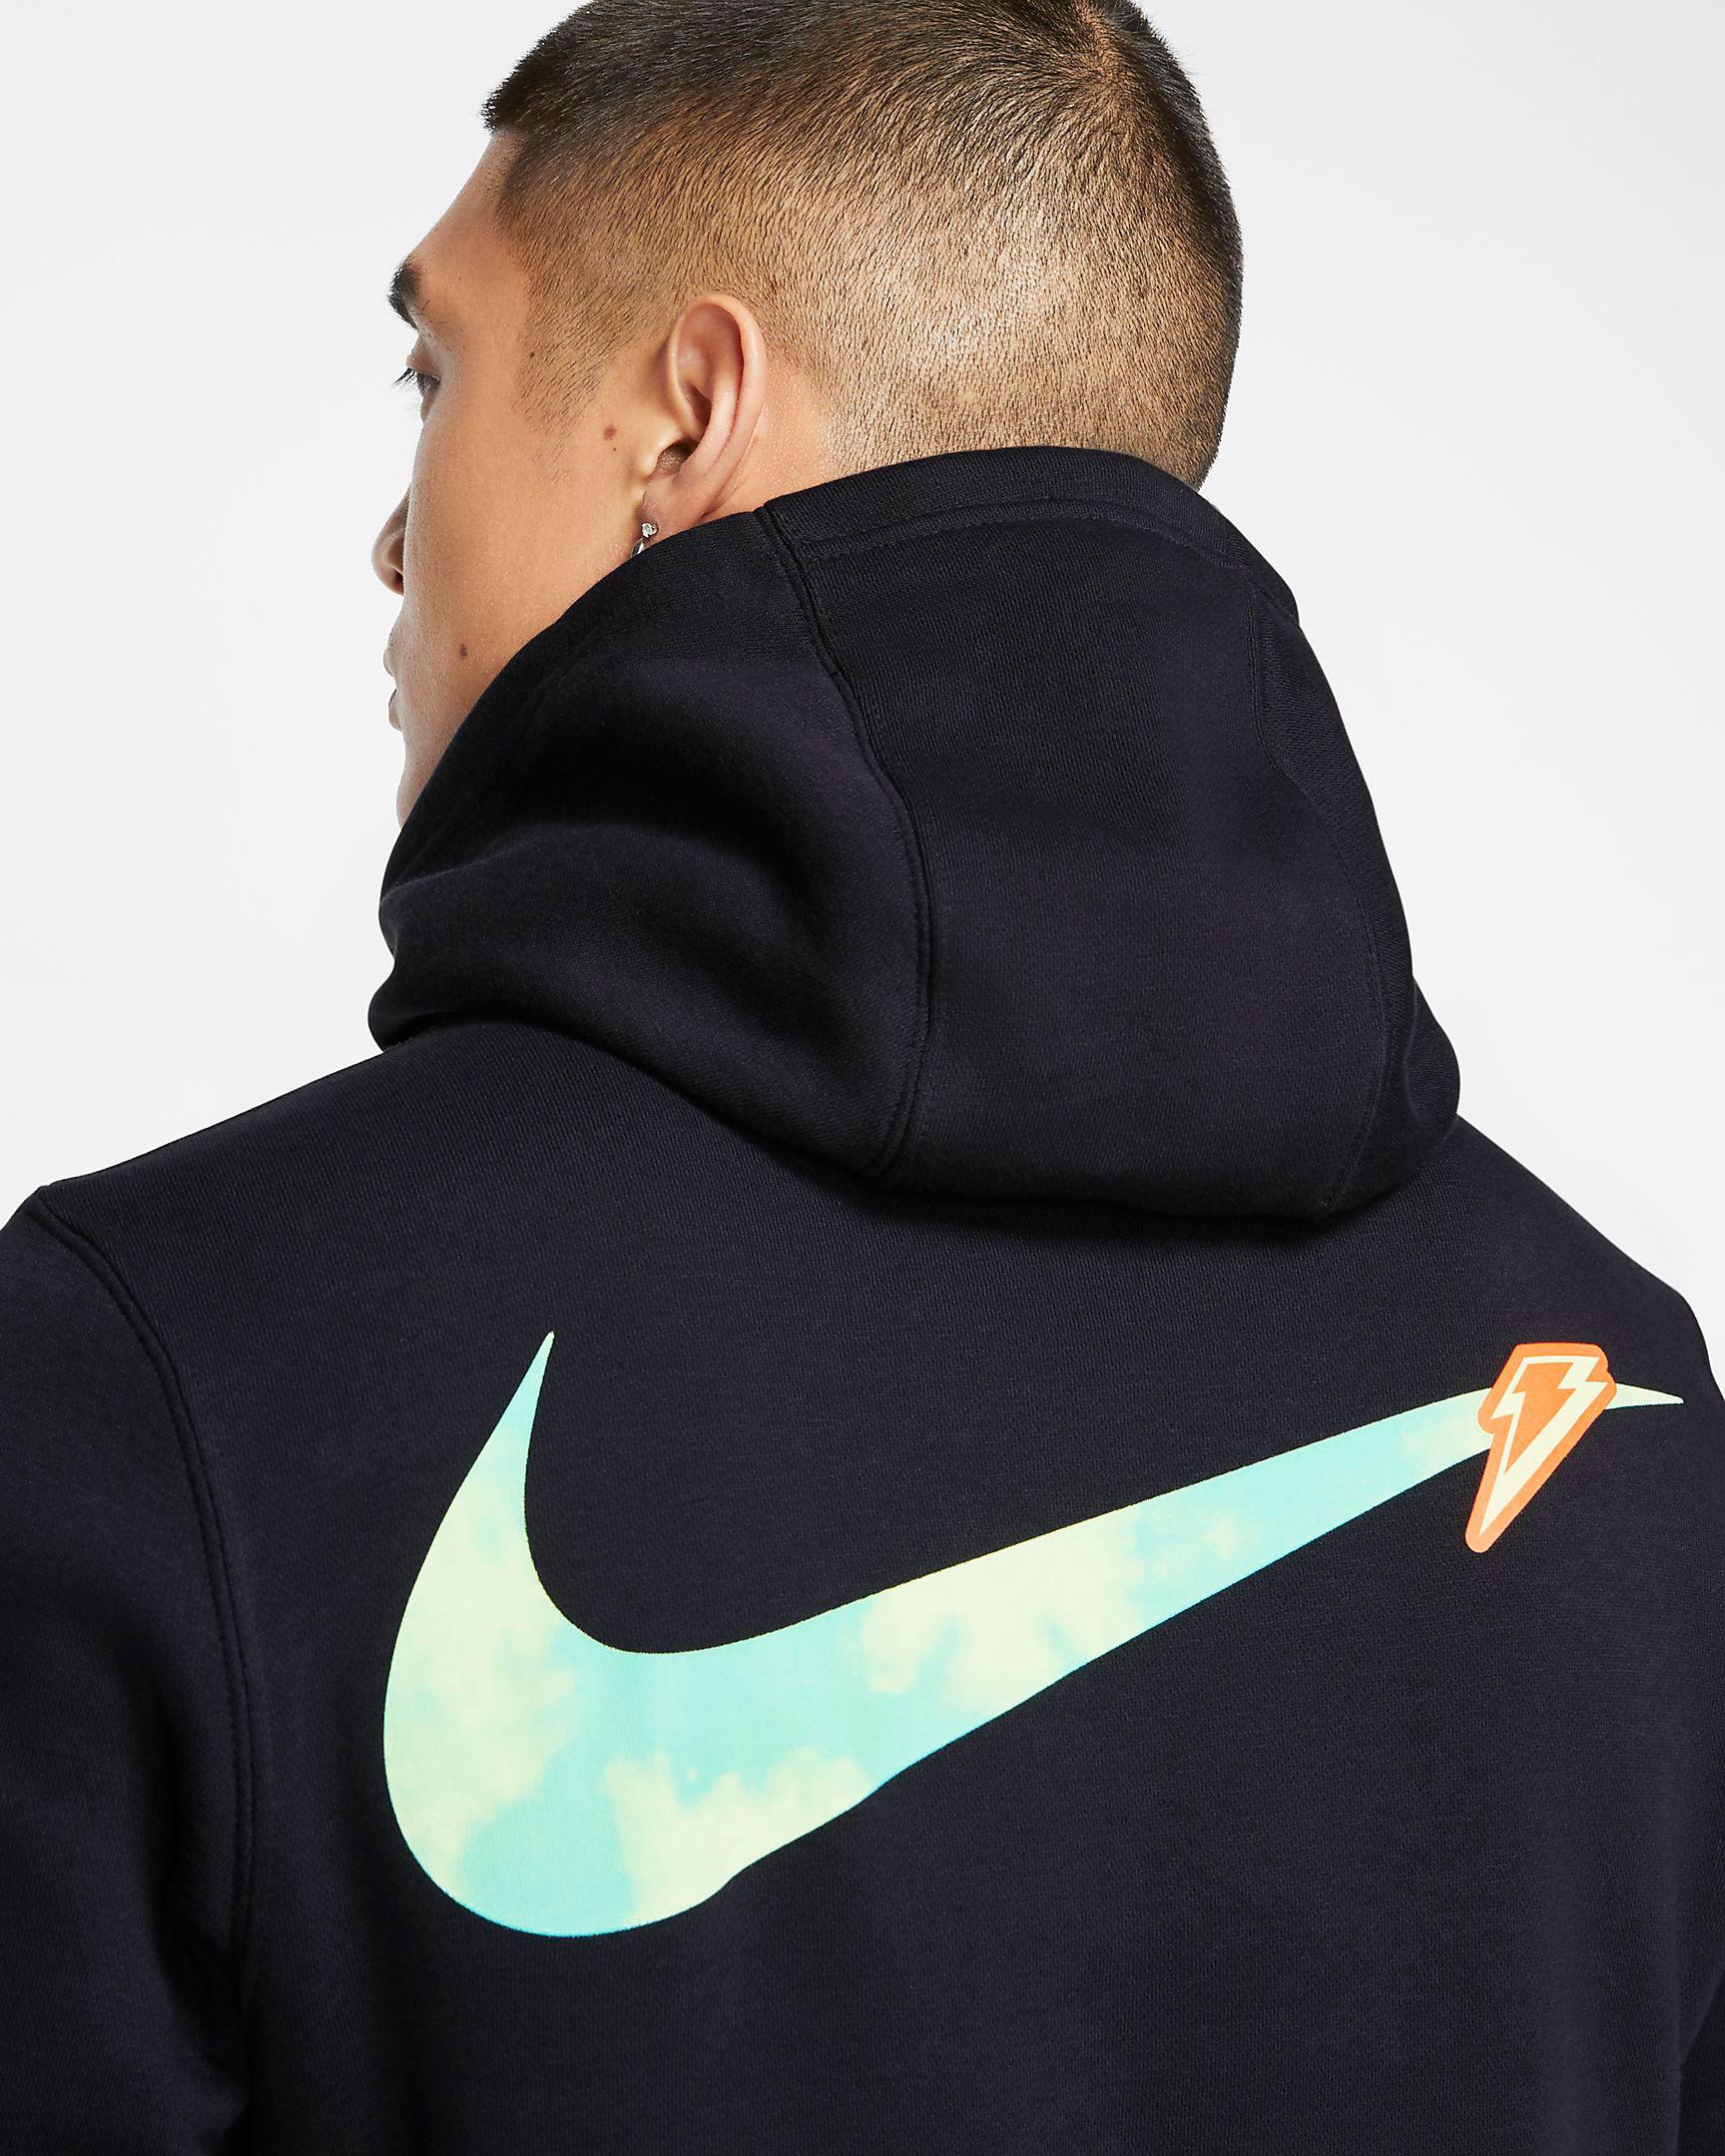 nike-pg-4-gatorade-all-star-hoodie-2